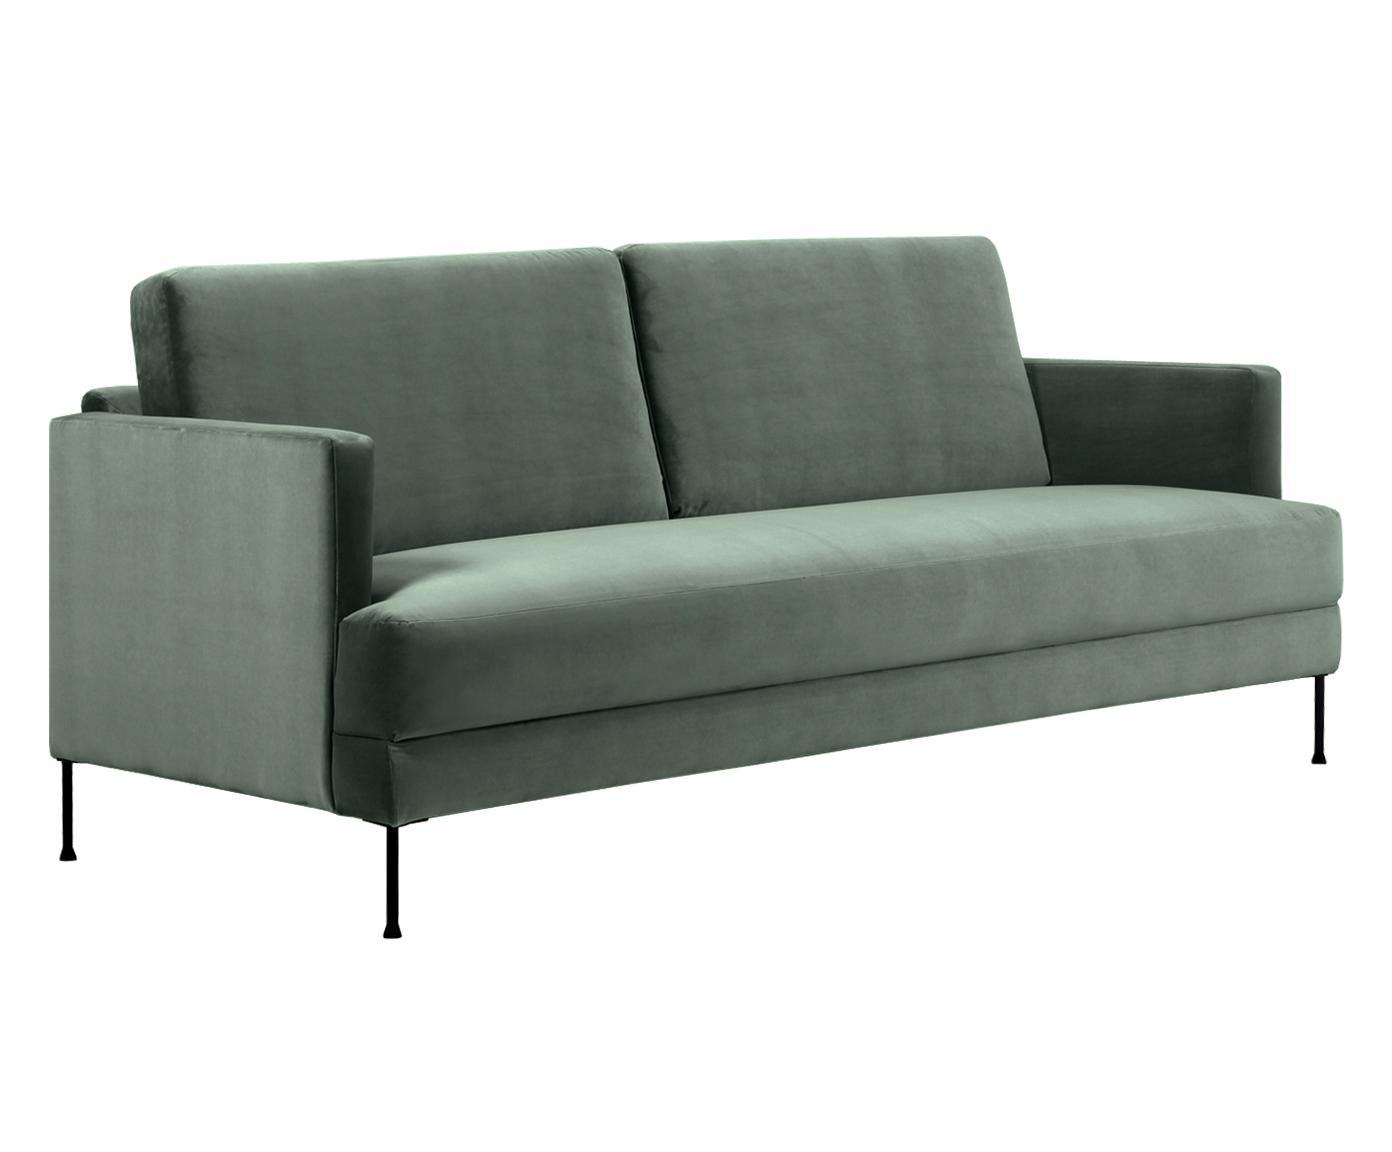 Samt-Sofa Fluente (3-Sitzer), Bezug: Samt (Hochwertiger Polyes, Gestell: Massives Kiefernholz, Füße: Metall, lackiert, Samt Grün, B 197 x T 83 cm